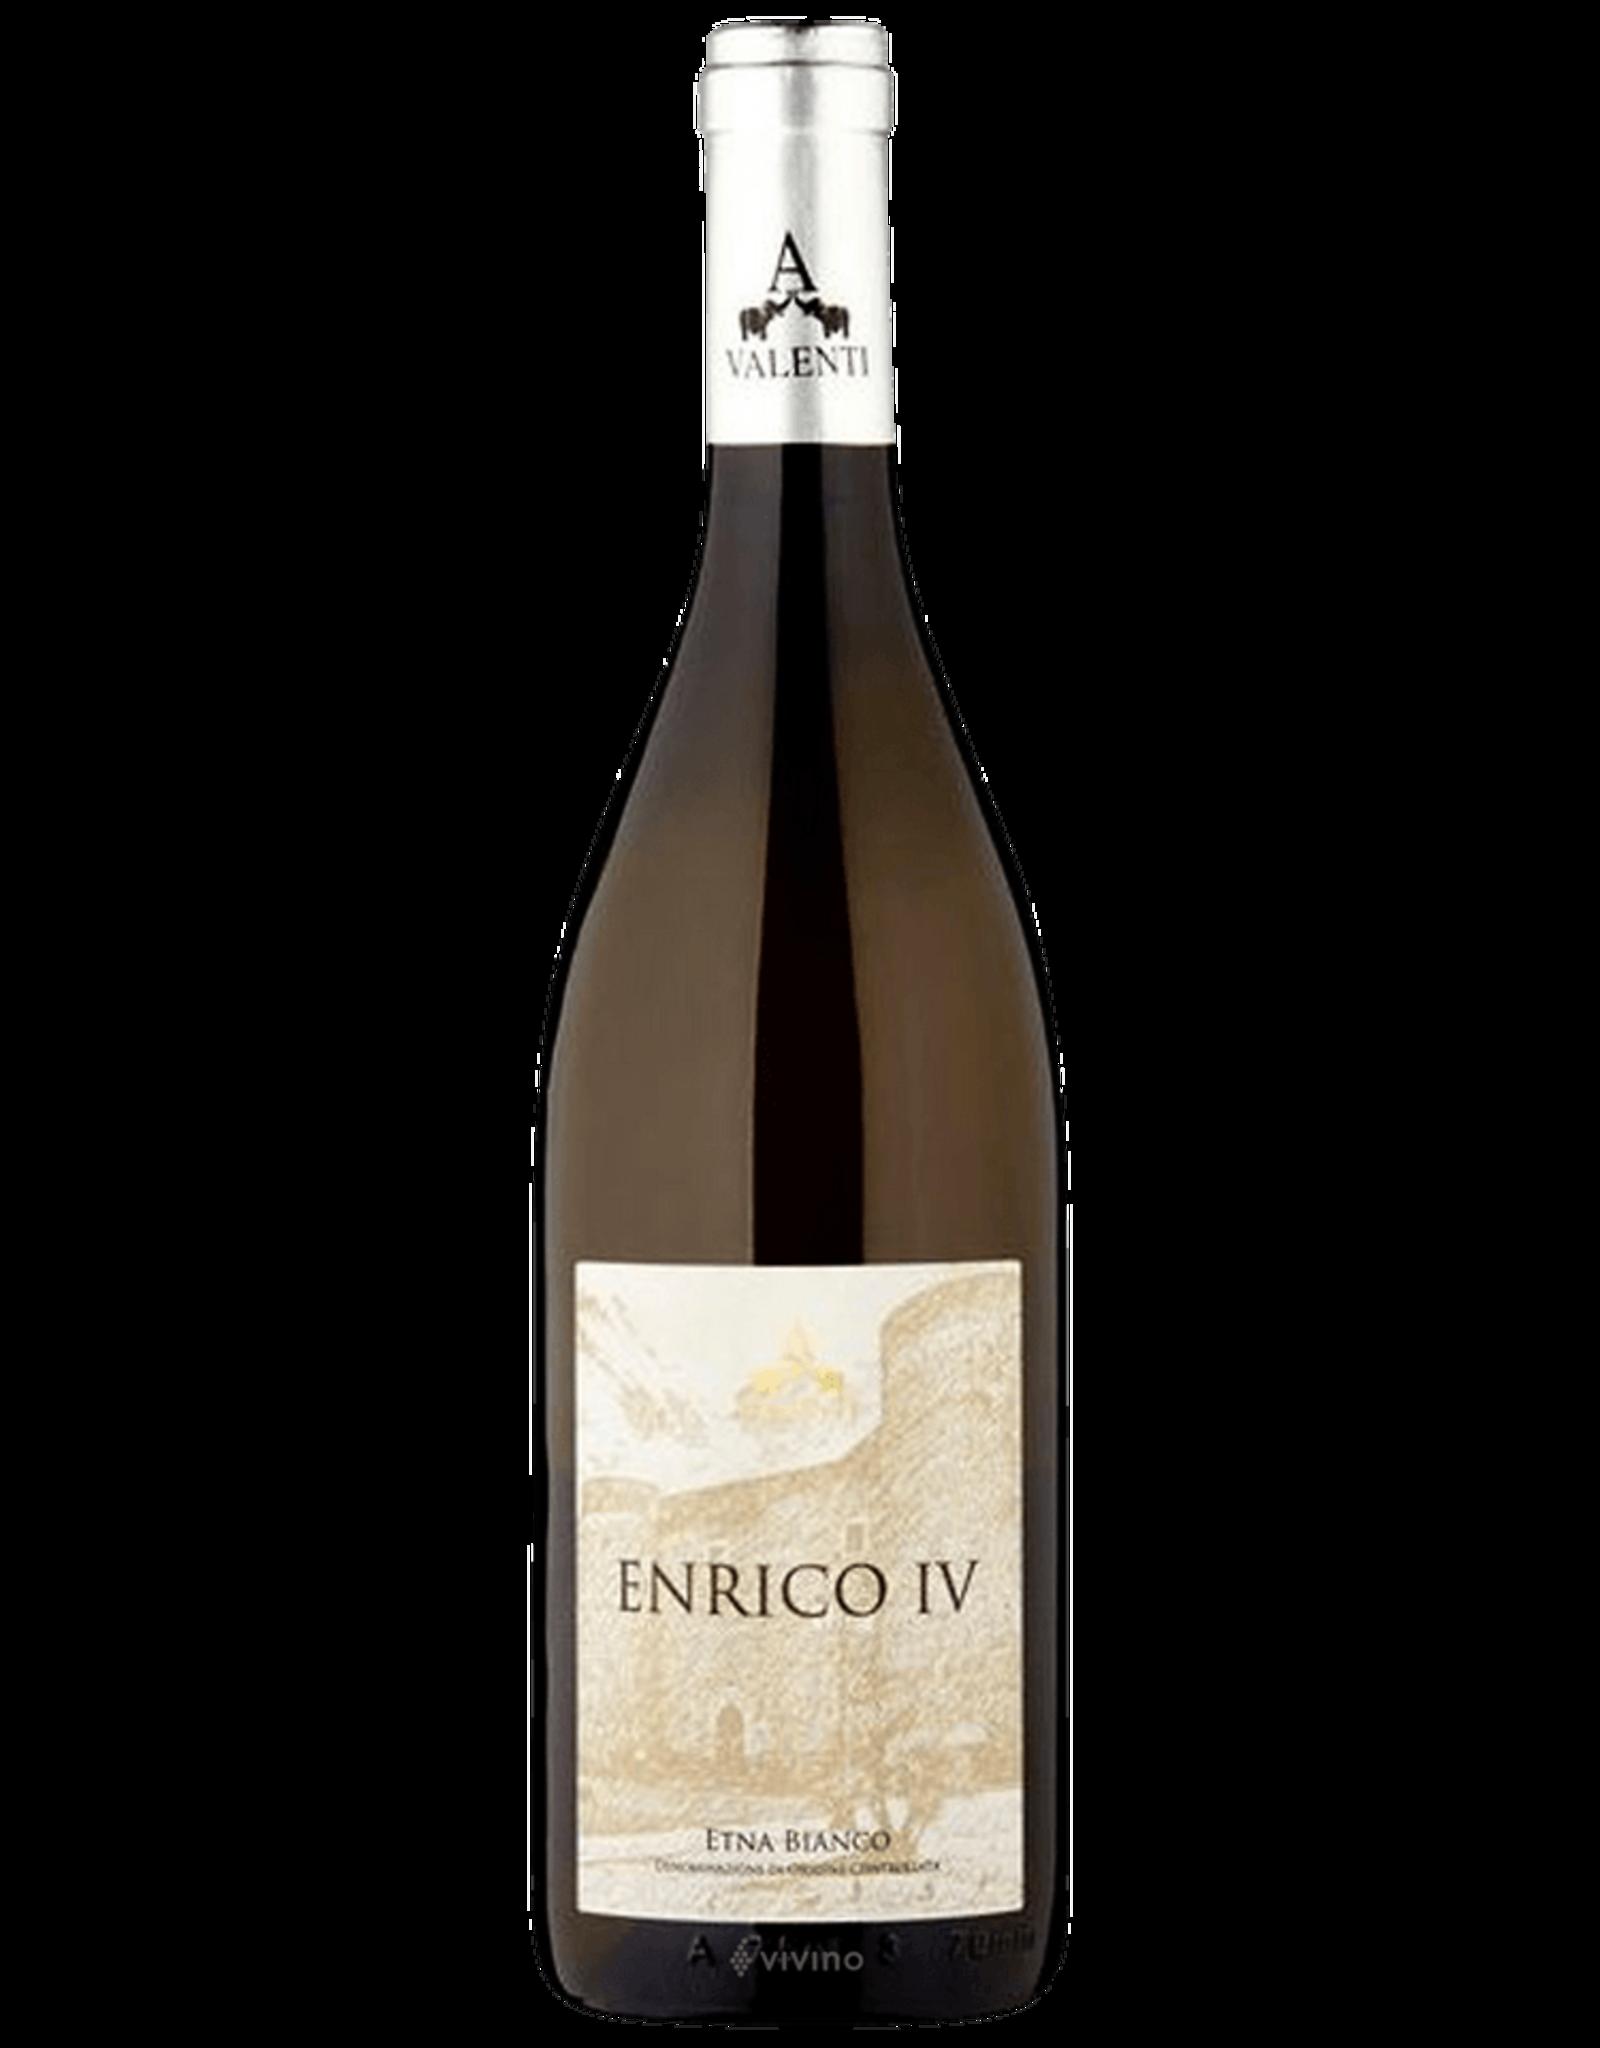 Valenti Enrico IV Etna Bianco 2017/18